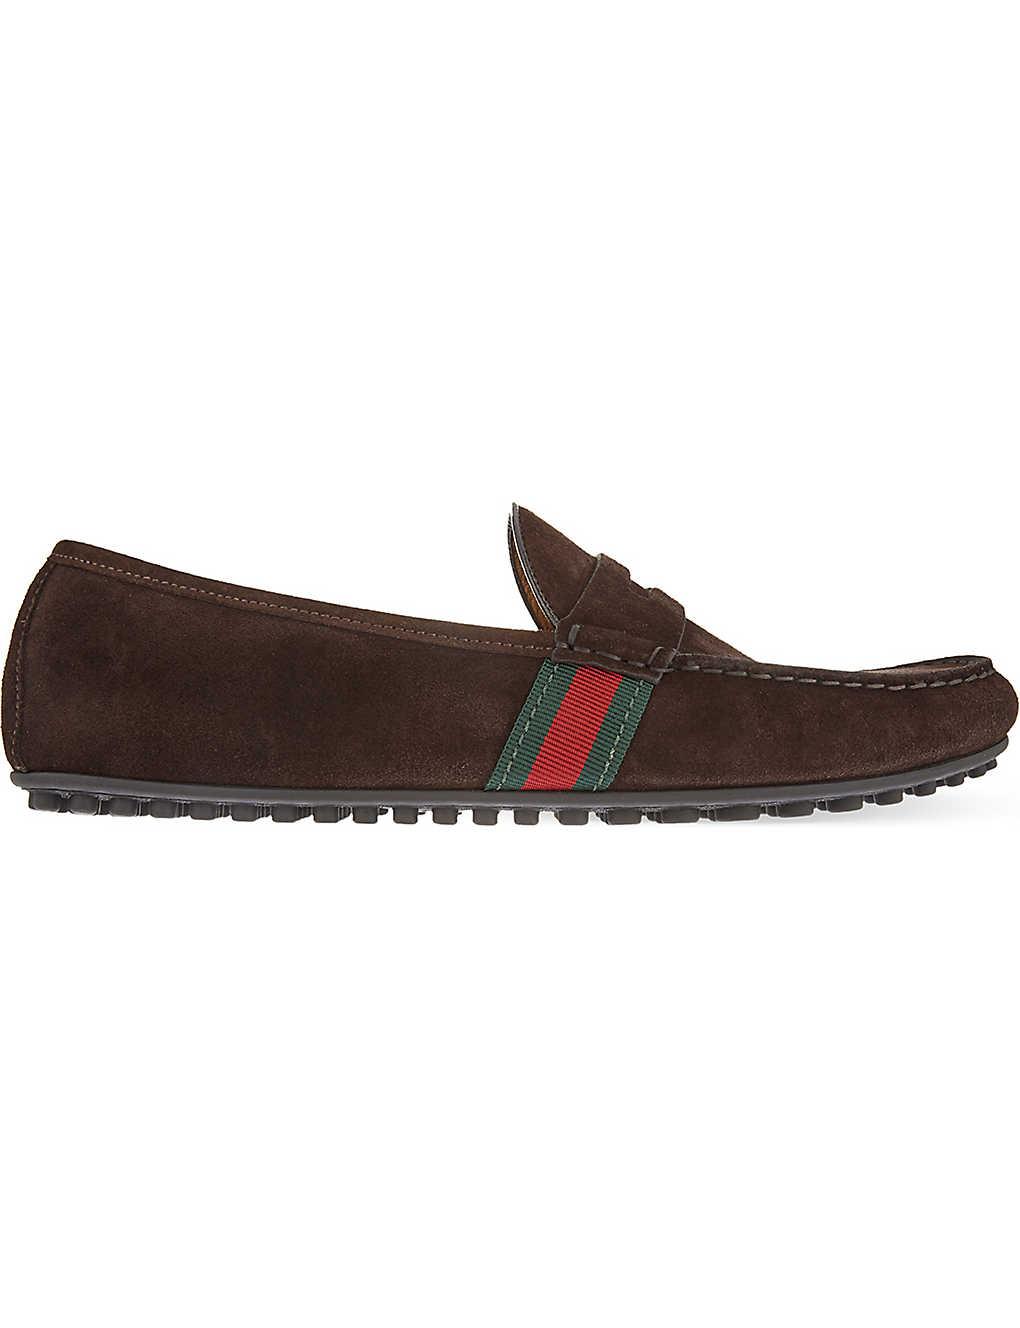 75befe61ec5 ... Kanye suede driver shoes zoom ...